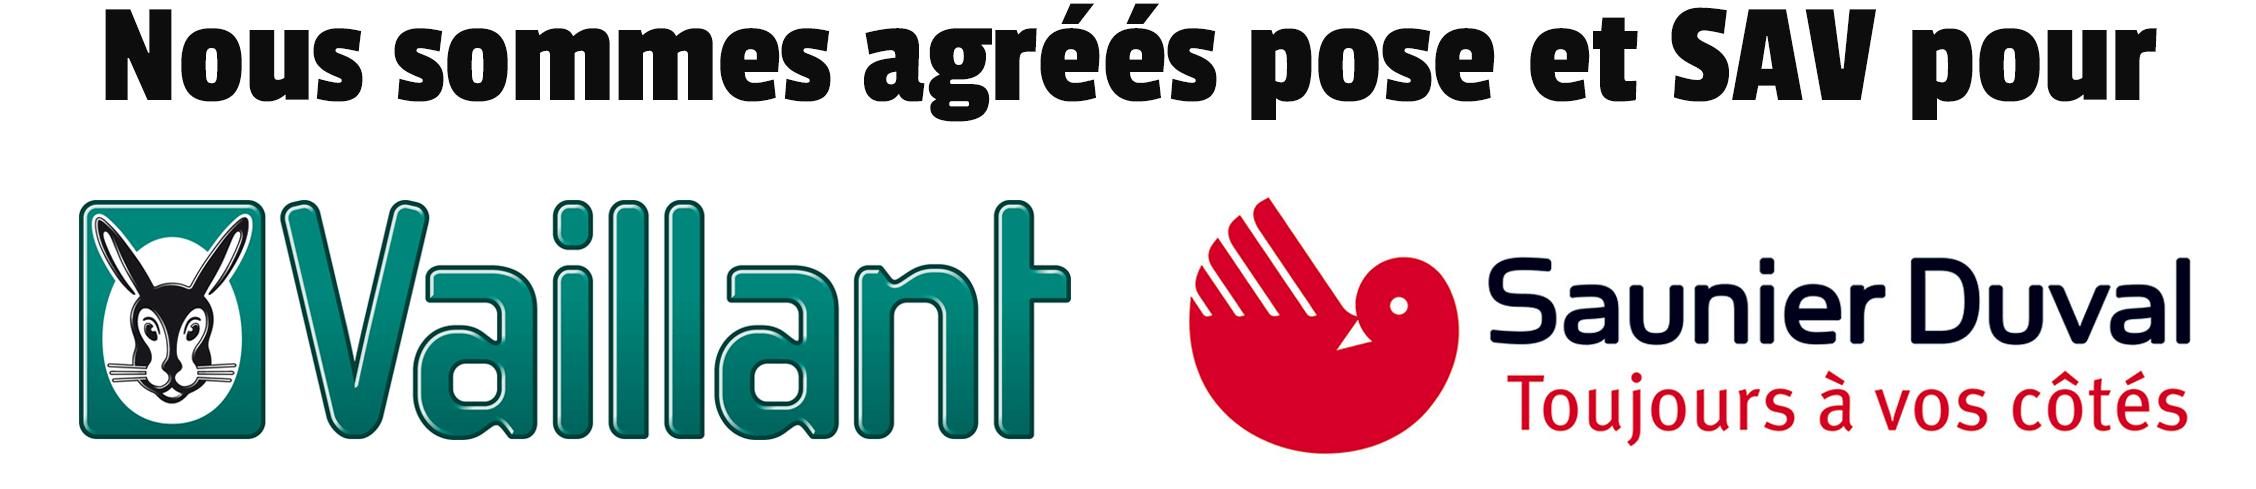 agree vaillant saunier - Accueil